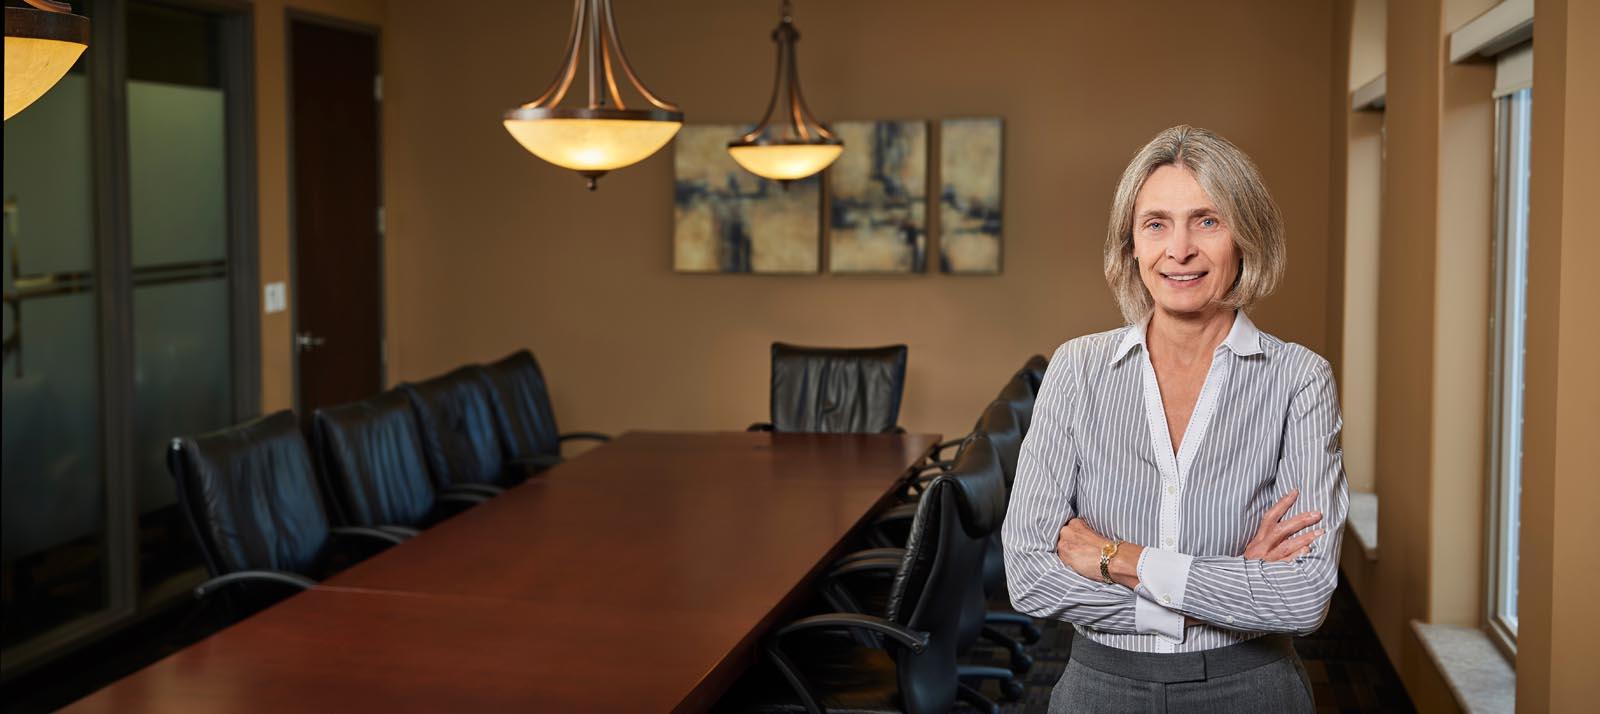 Marlene_McGraw_Millards Chartered Professional Accountants